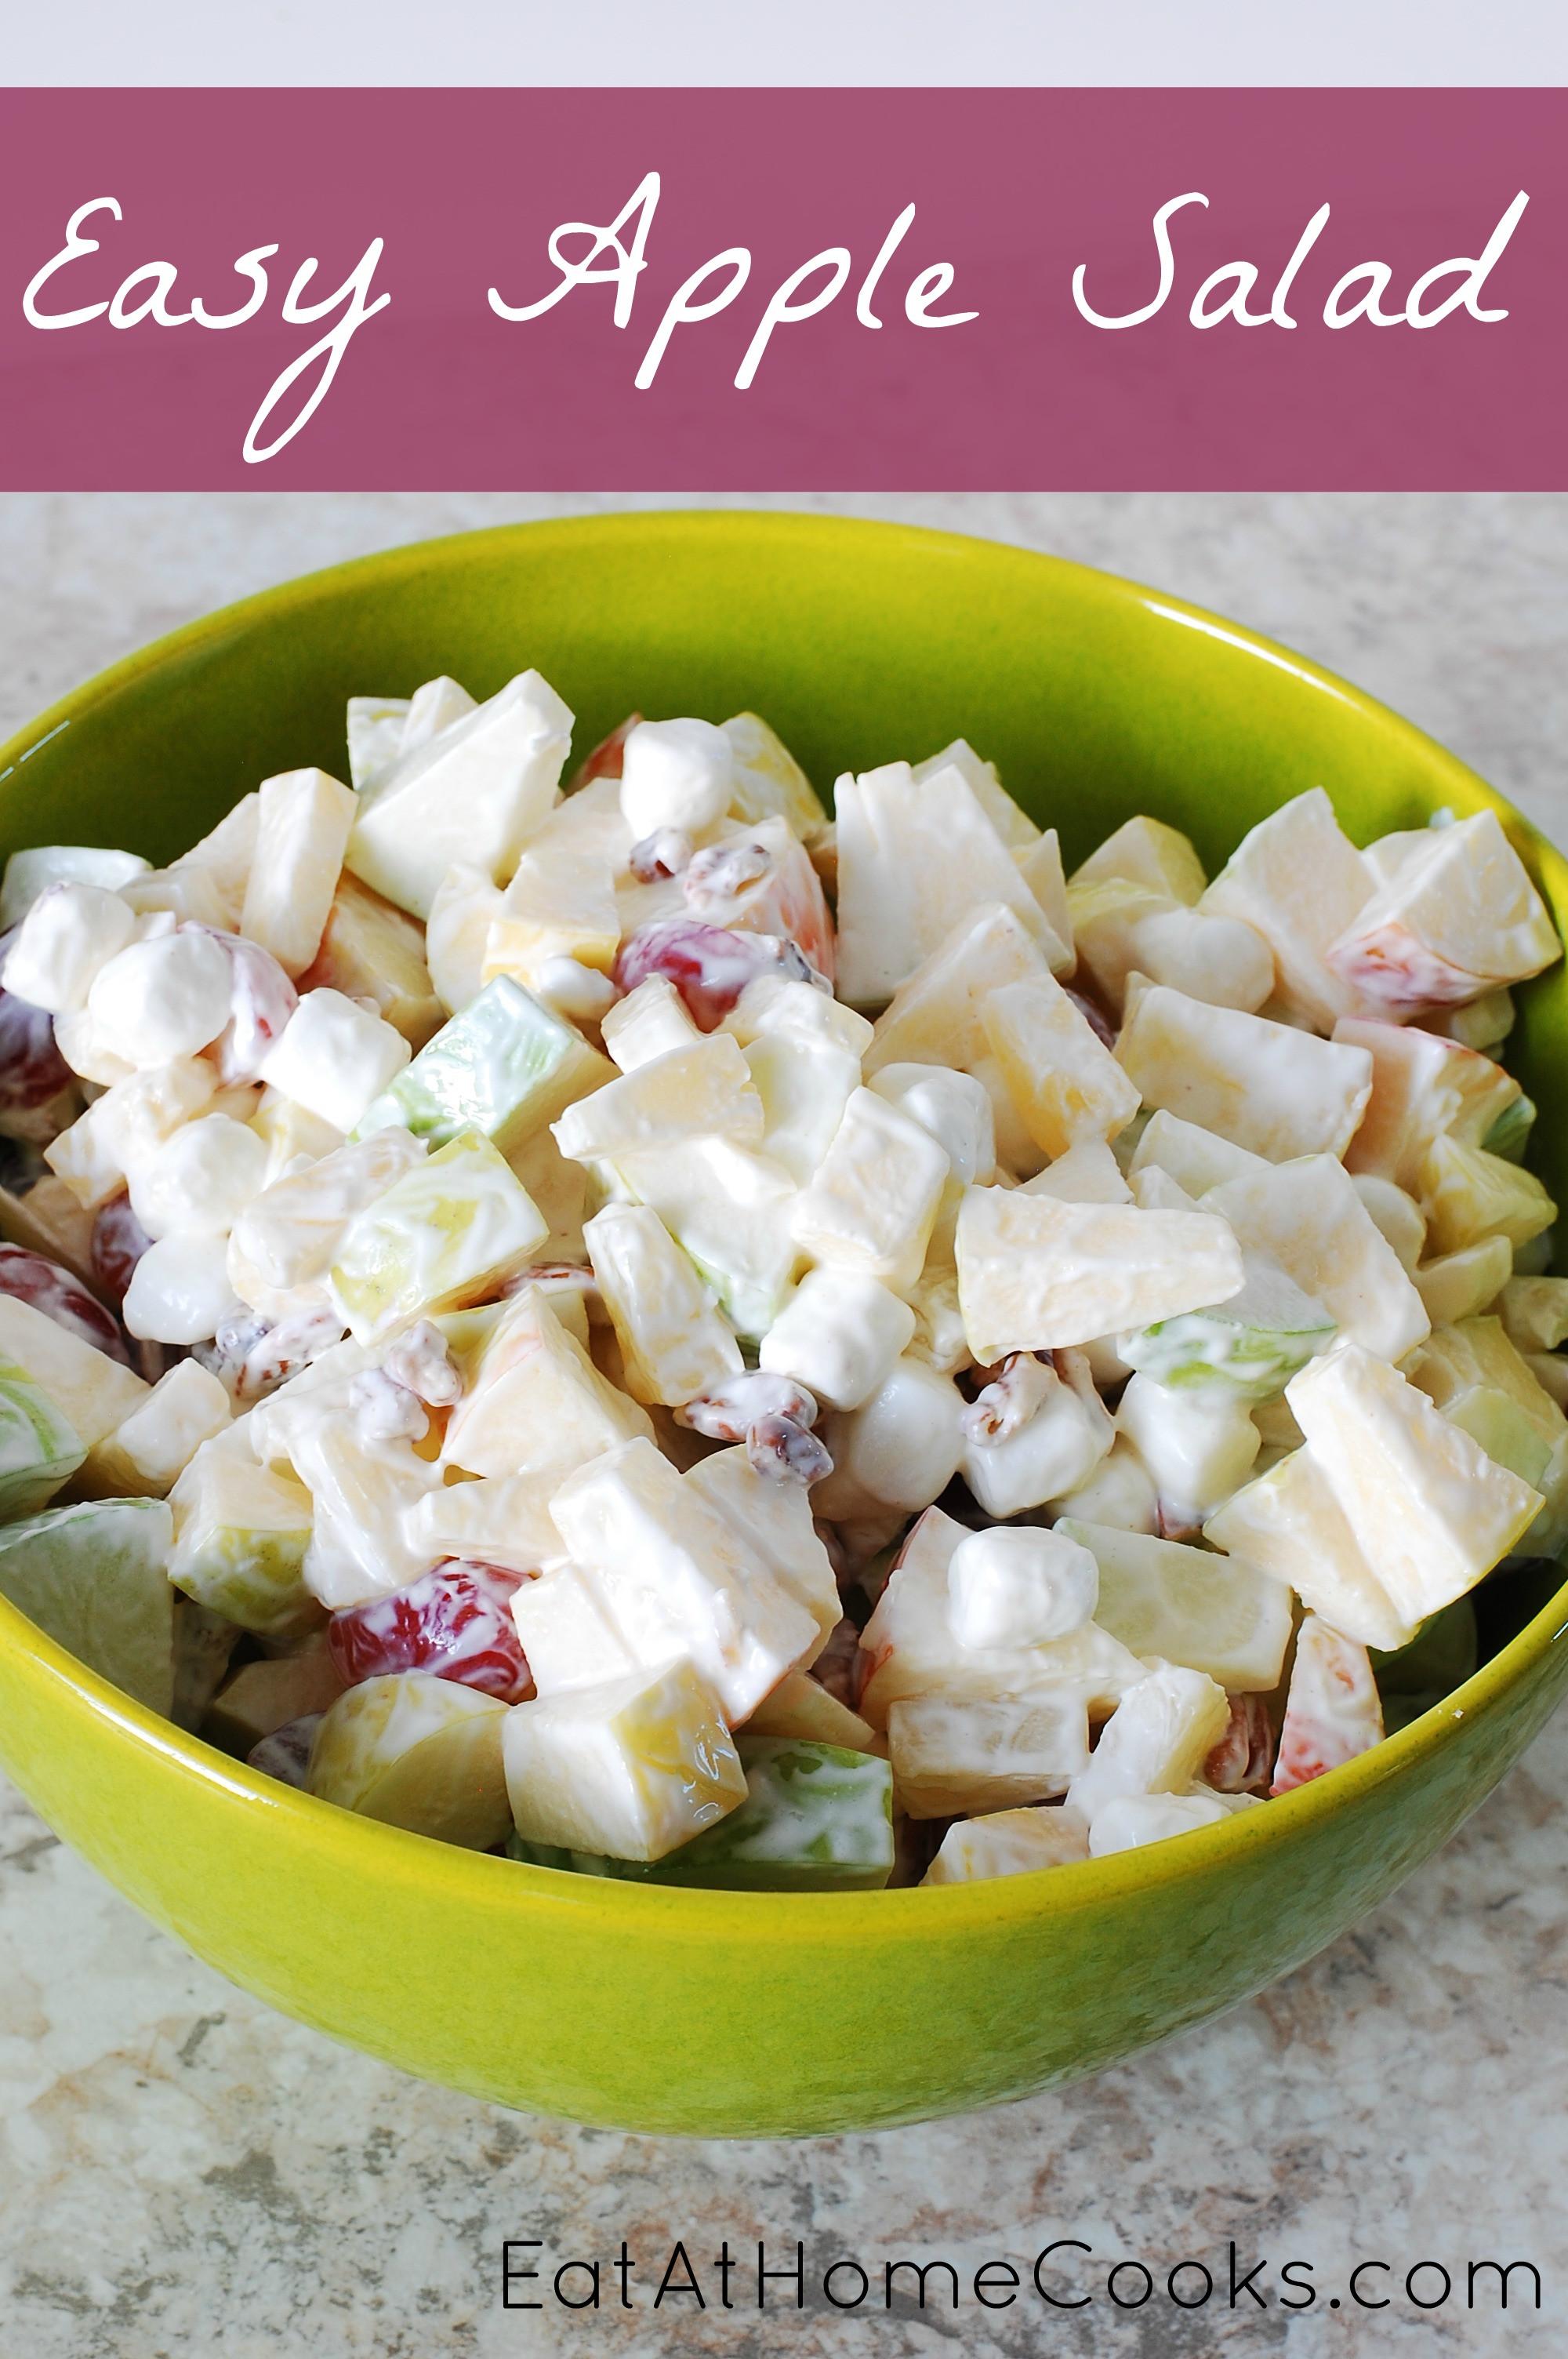 Apple Salad Recipes  Easy Apple Salad Eat at Home